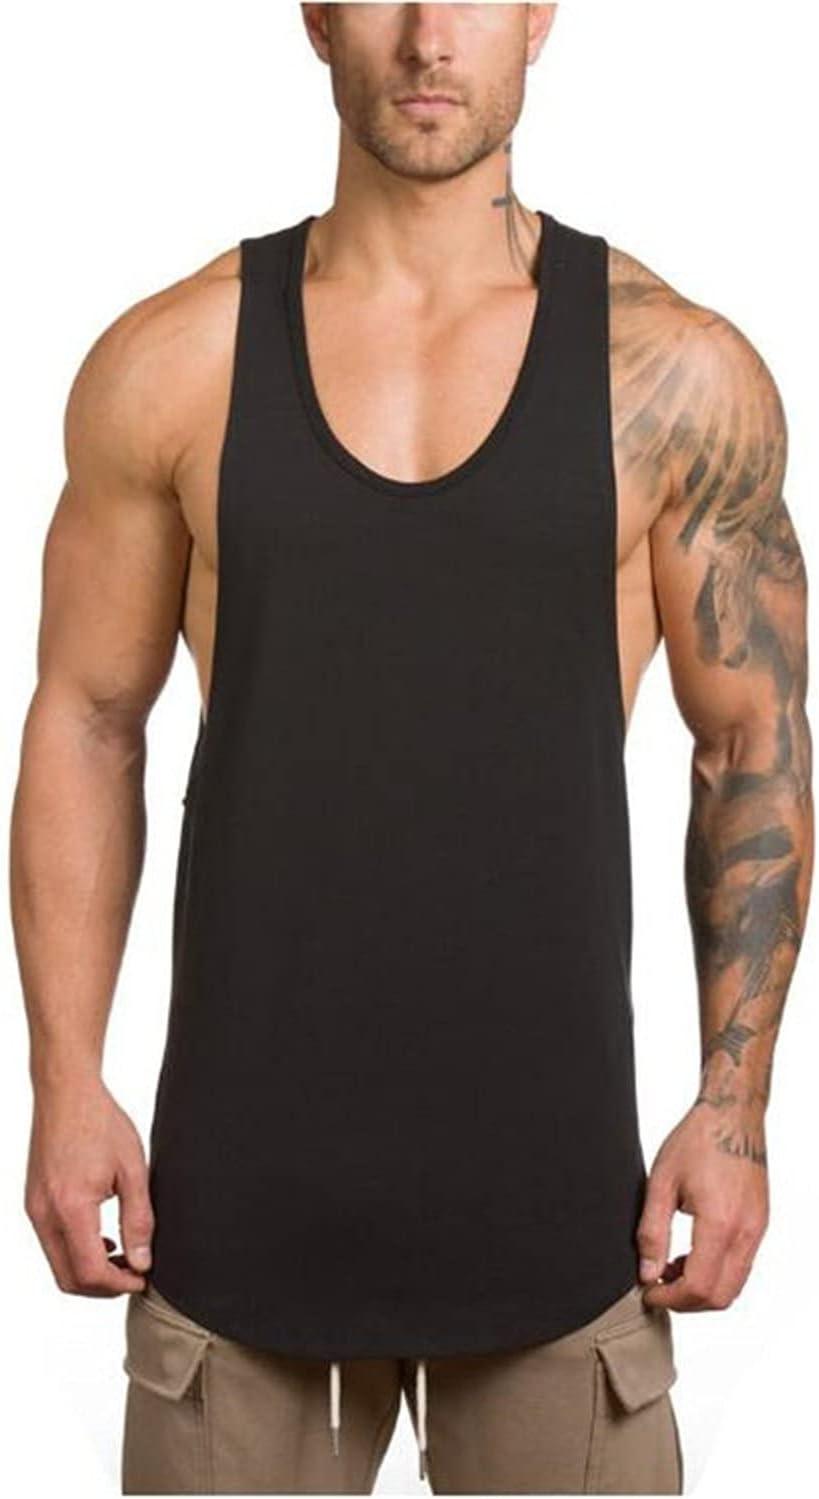 Men's Gym Bodybuilding Tank Gifts Top Workout Alternative dealer Sle Muscle Fitness Shirt